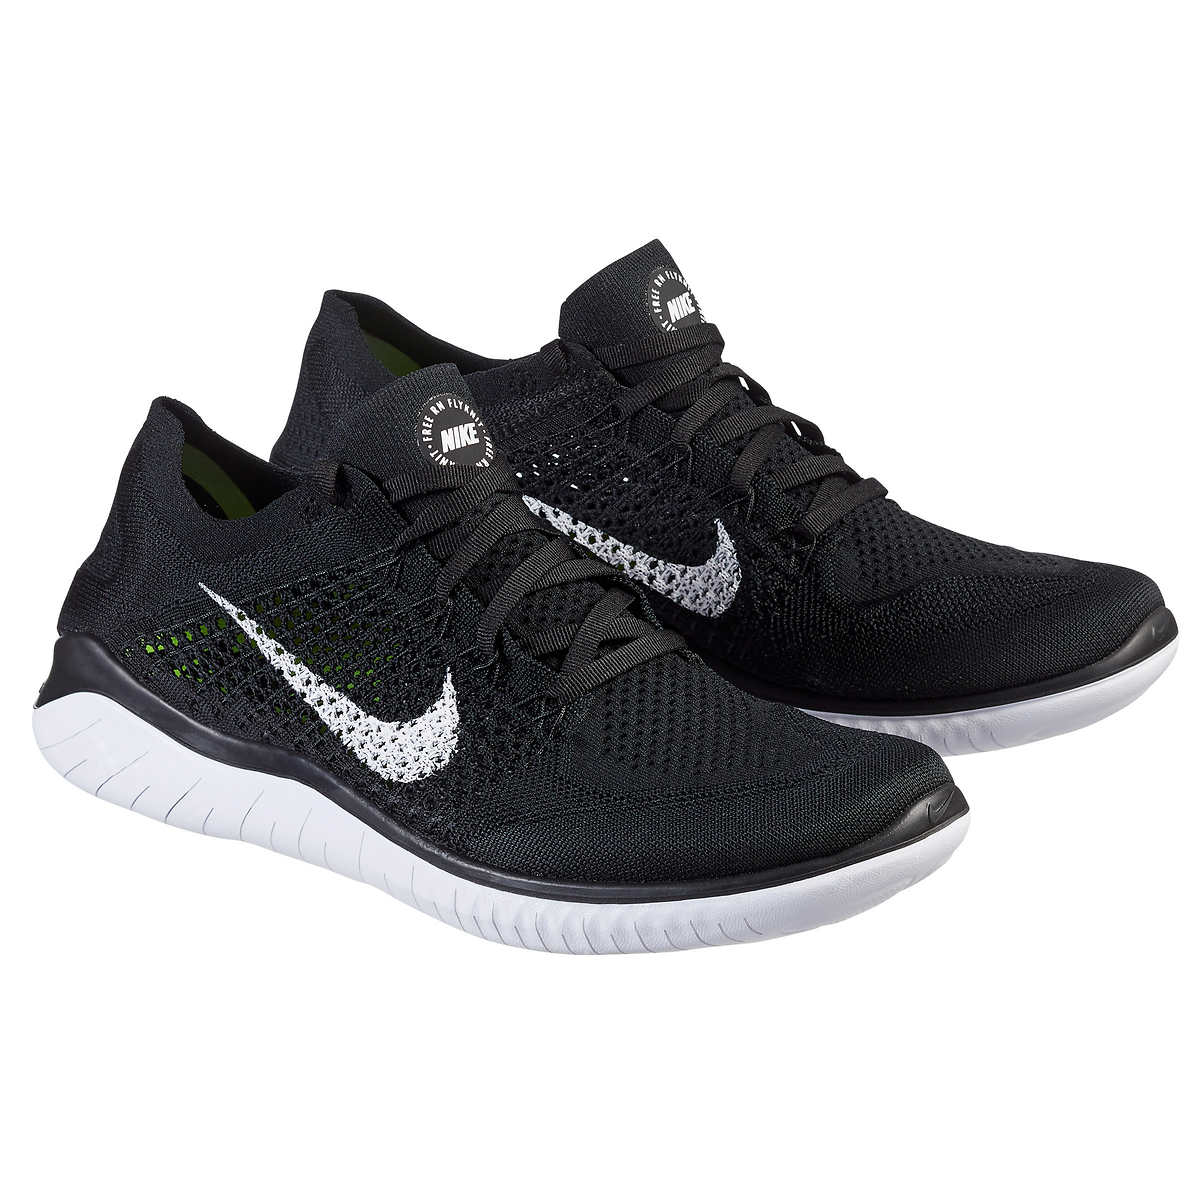 brand new 9accf faf34 ... Nike Men s Free Run Flyknit Shoe. black 1 black 1